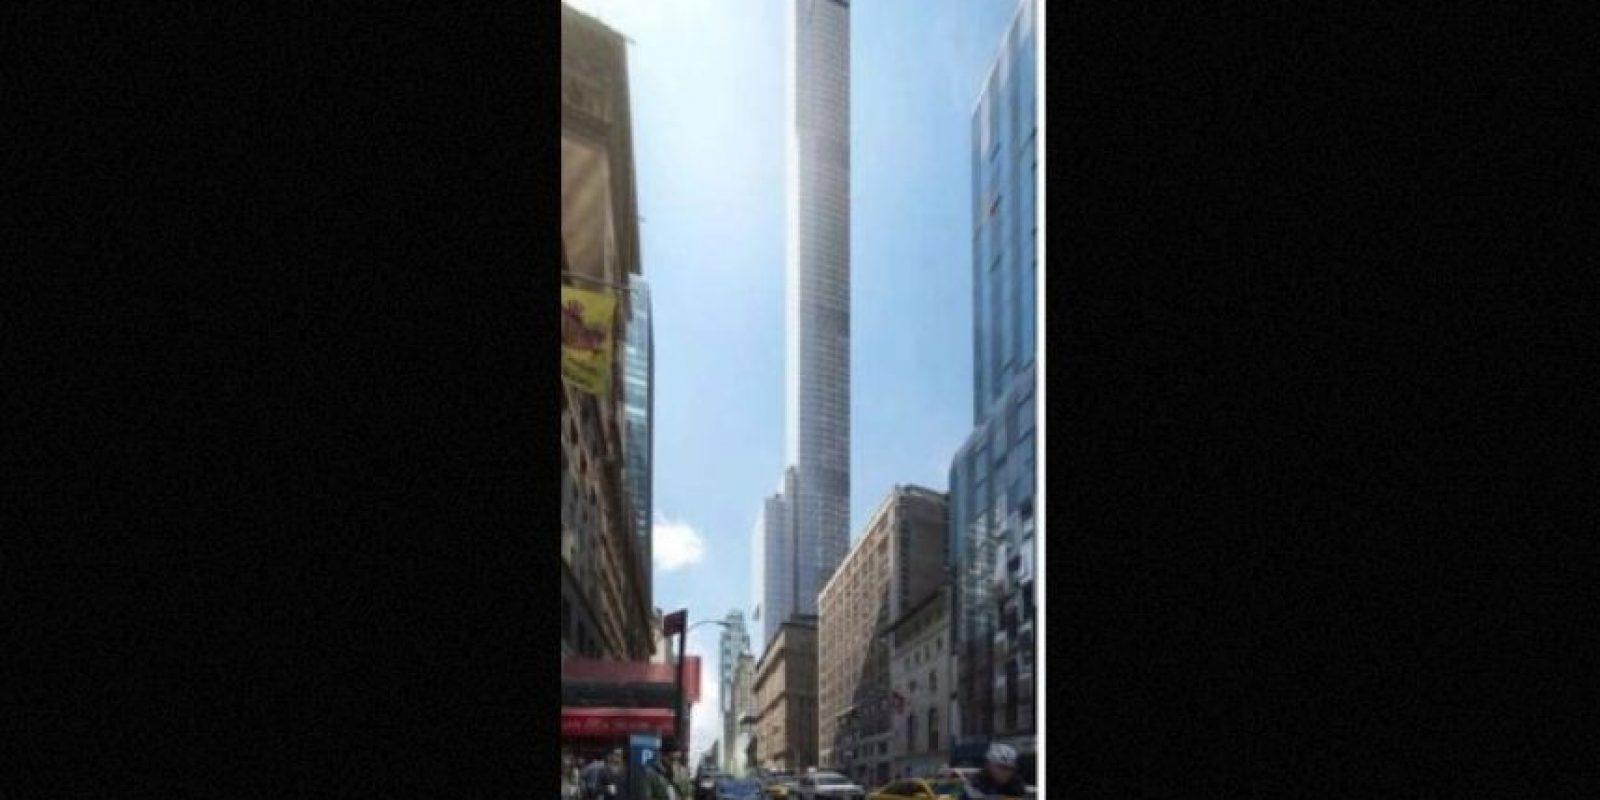 Será completado en 2018 Foto:Adrian Smith + Gordon Gill Architecture – Skyscrapercenter.com